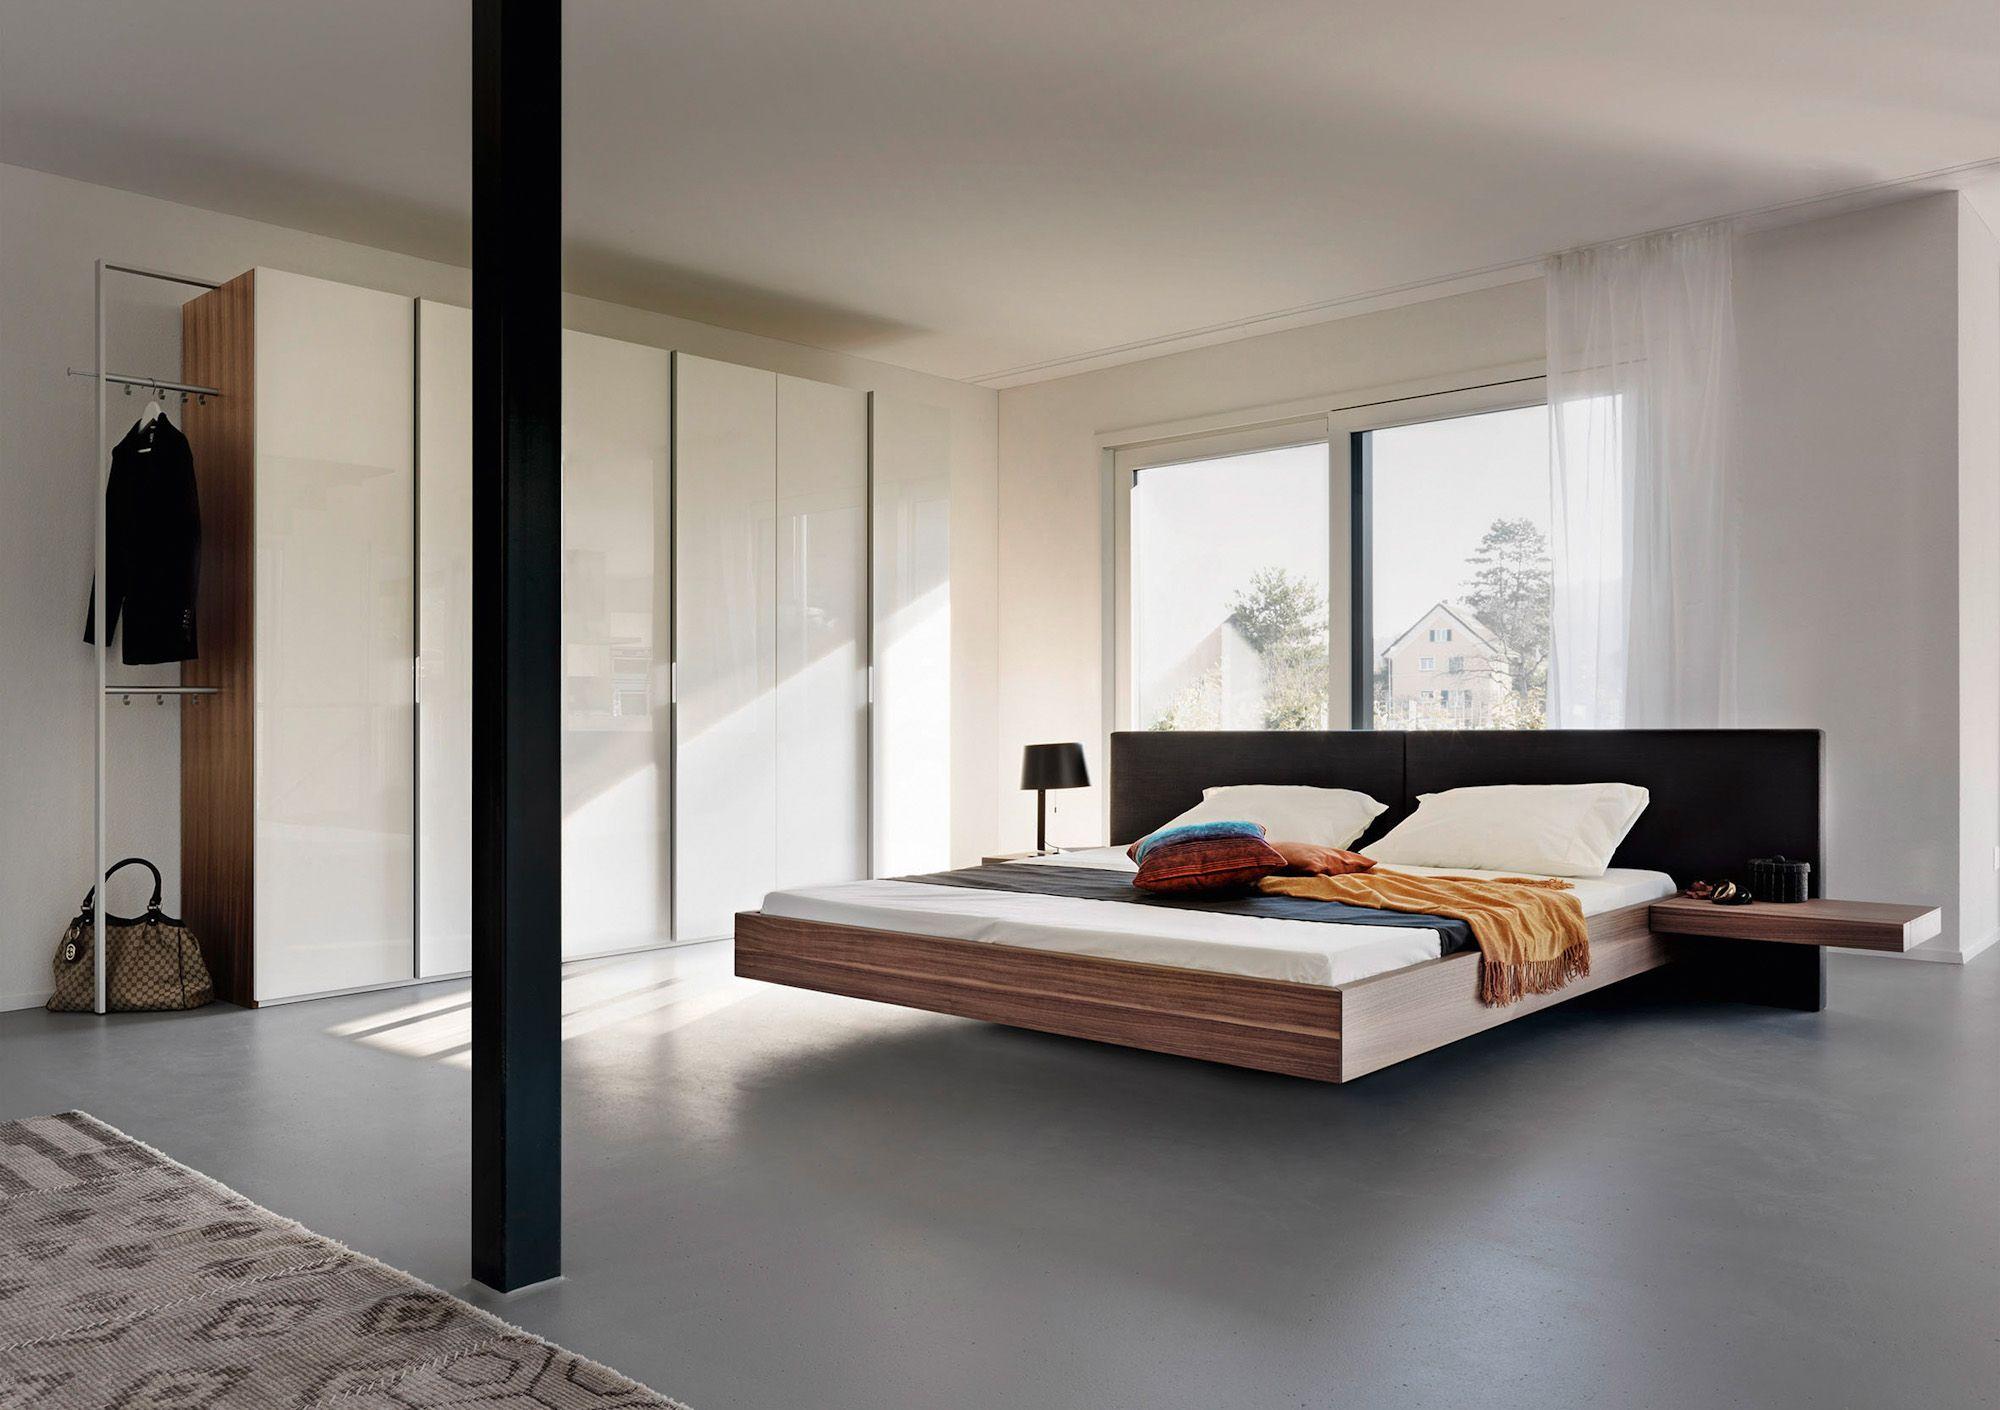 schwebebett holz leder doppelbett hohe kopfleiste bei m bel morschett schlafen. Black Bedroom Furniture Sets. Home Design Ideas